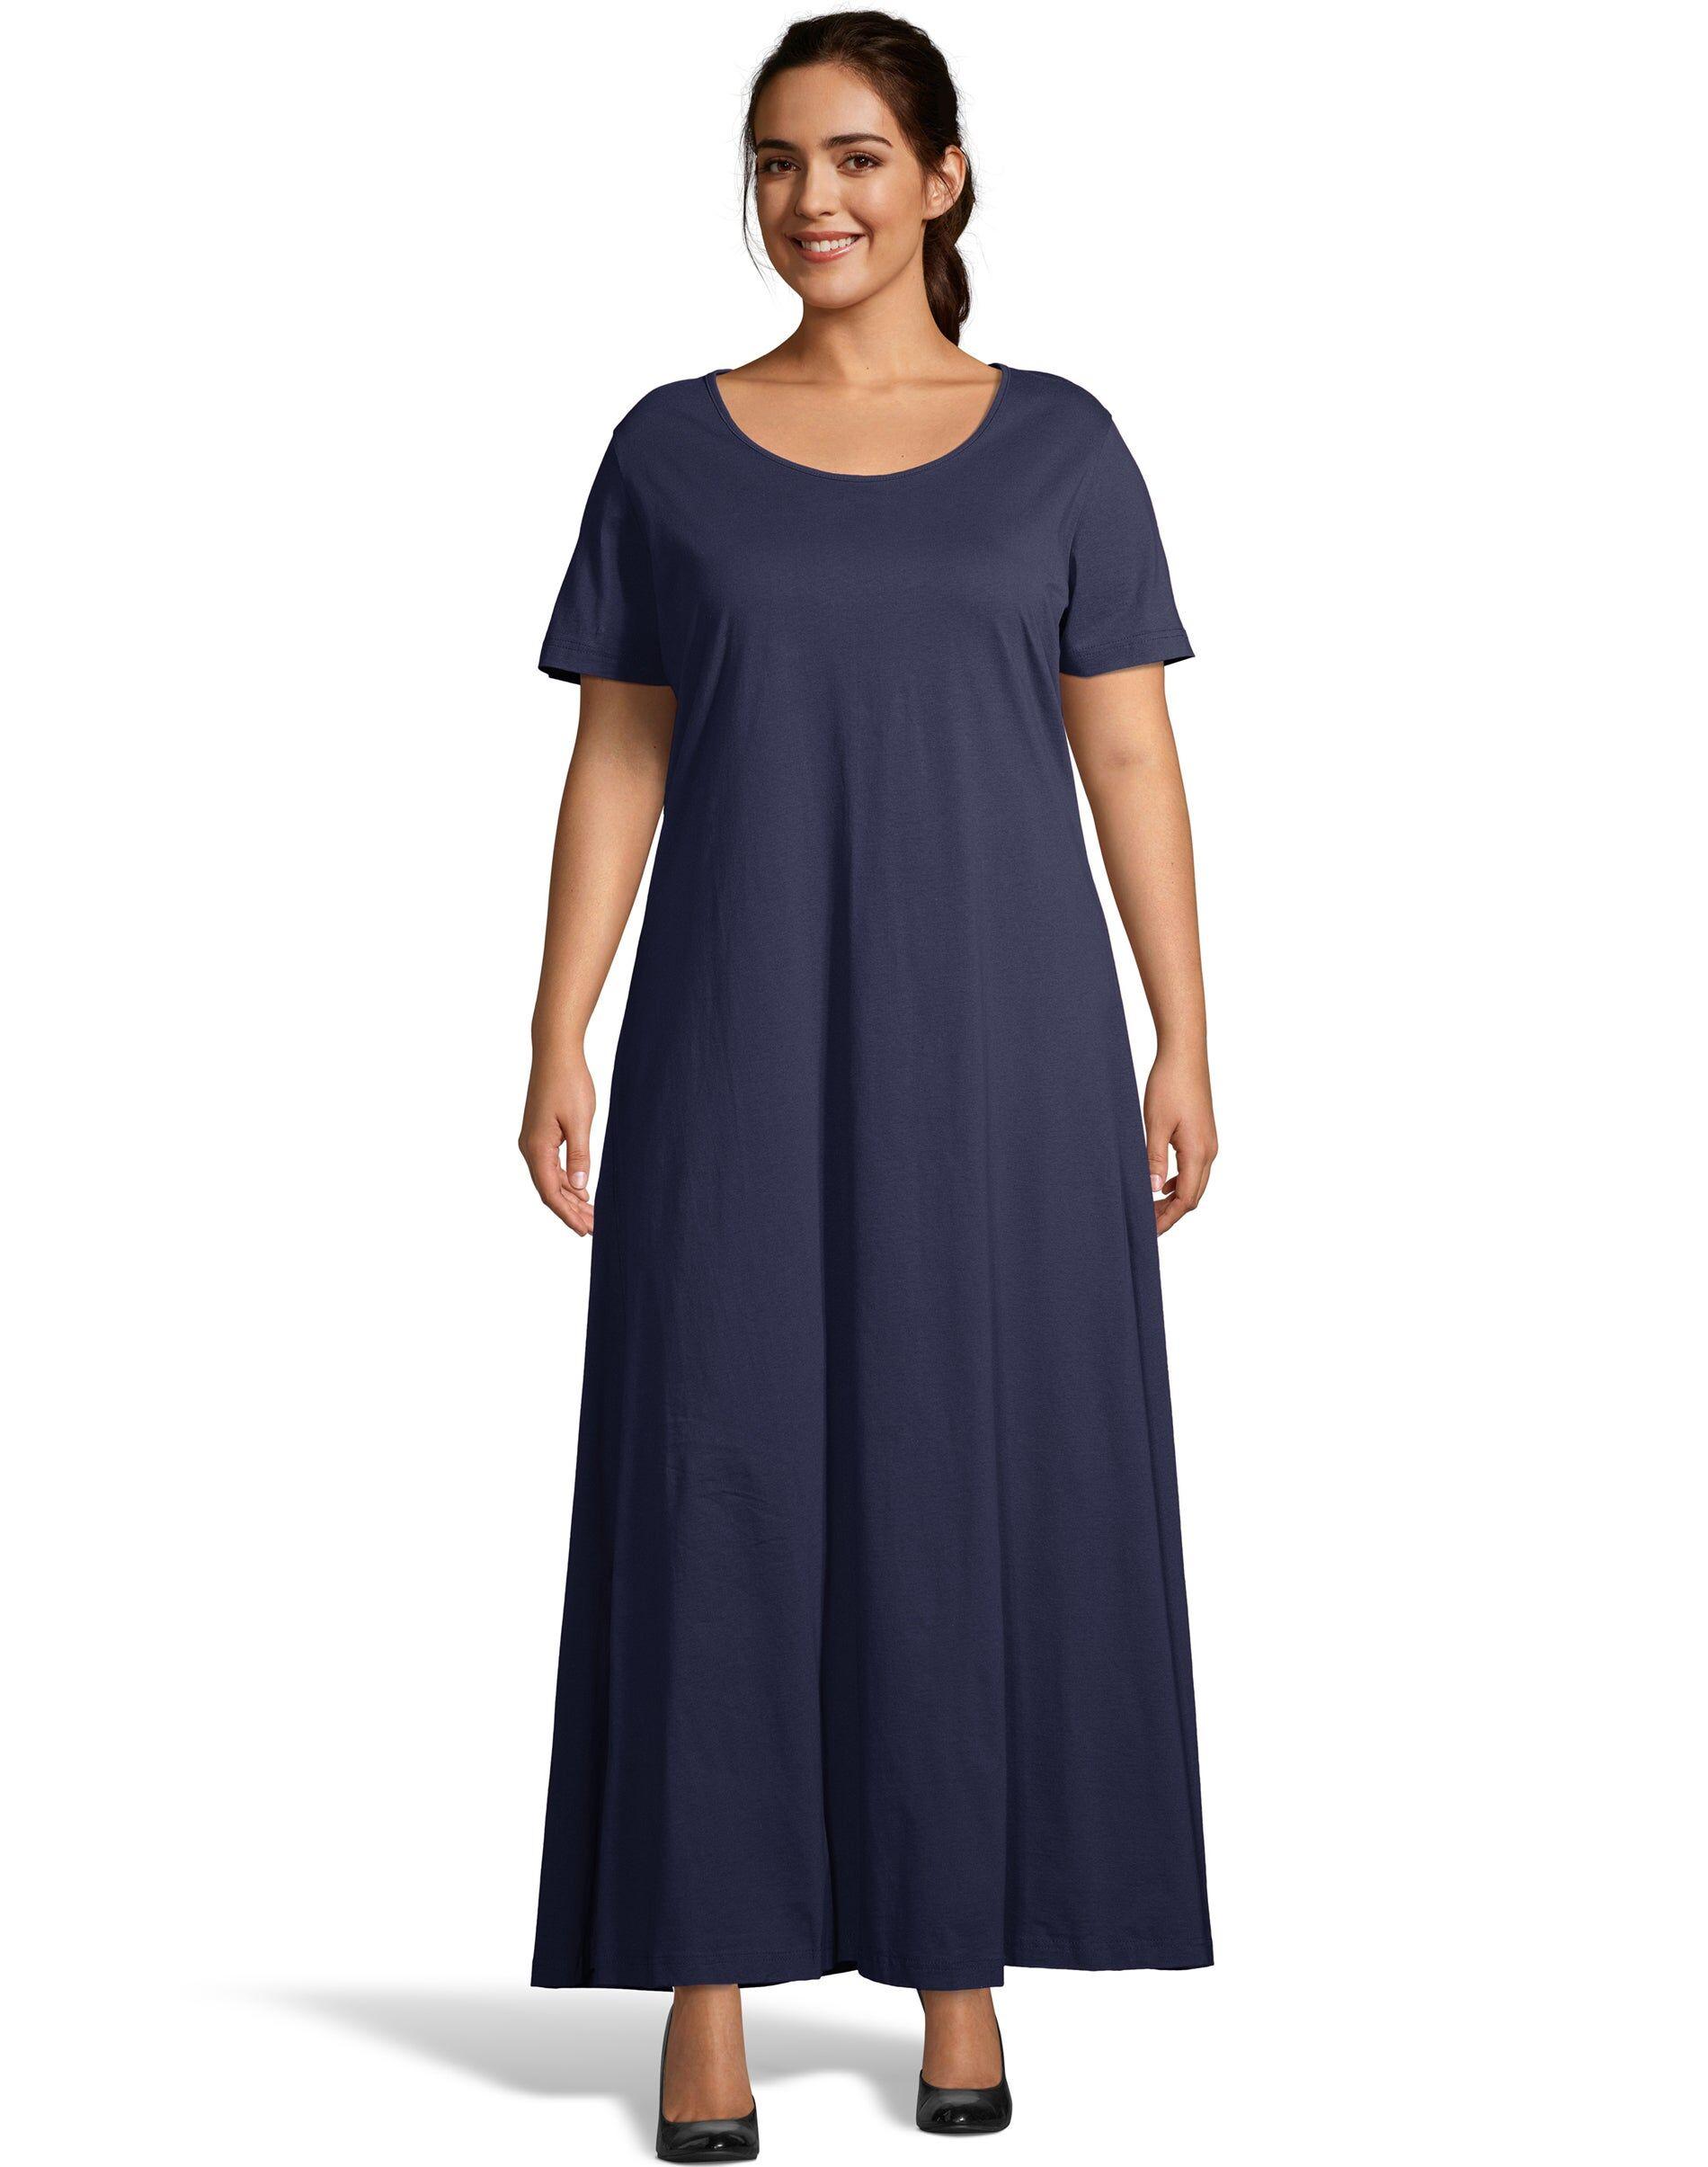 Just My Size Jersey Matchables Maxi Dress Navy 5X Women's